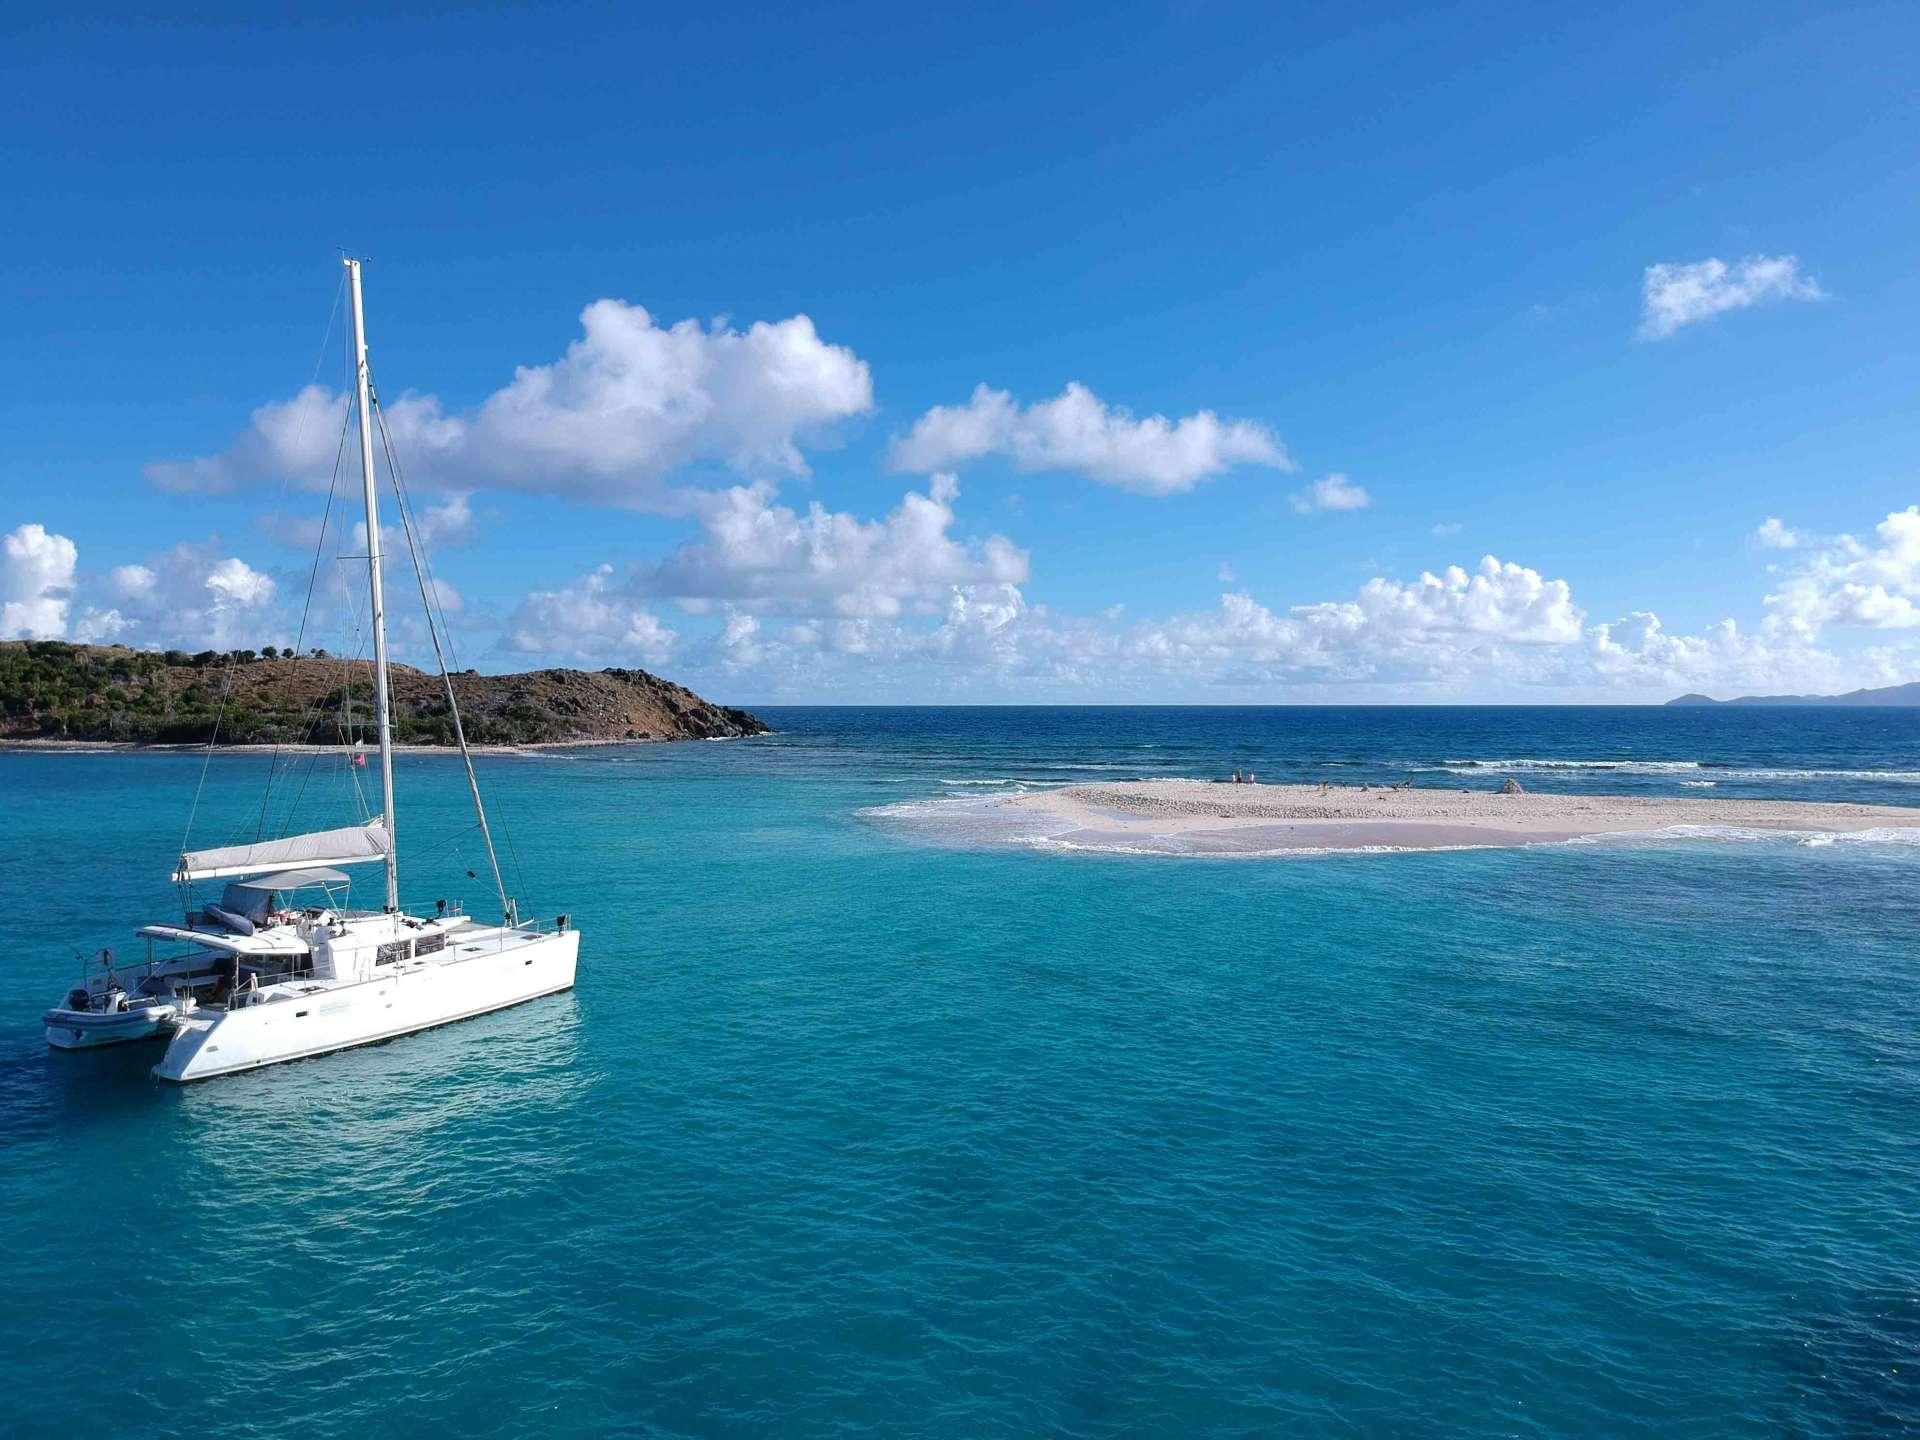 Main image of GYPSY PRINCESS yacht